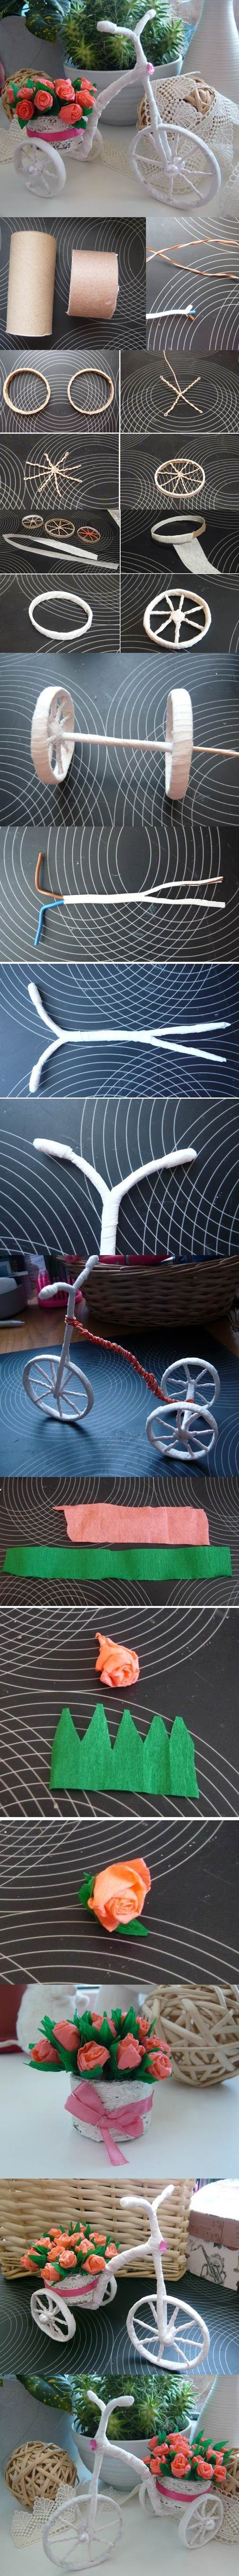 DIY Little Bike Carrying Beautiful Flowers Decoration: